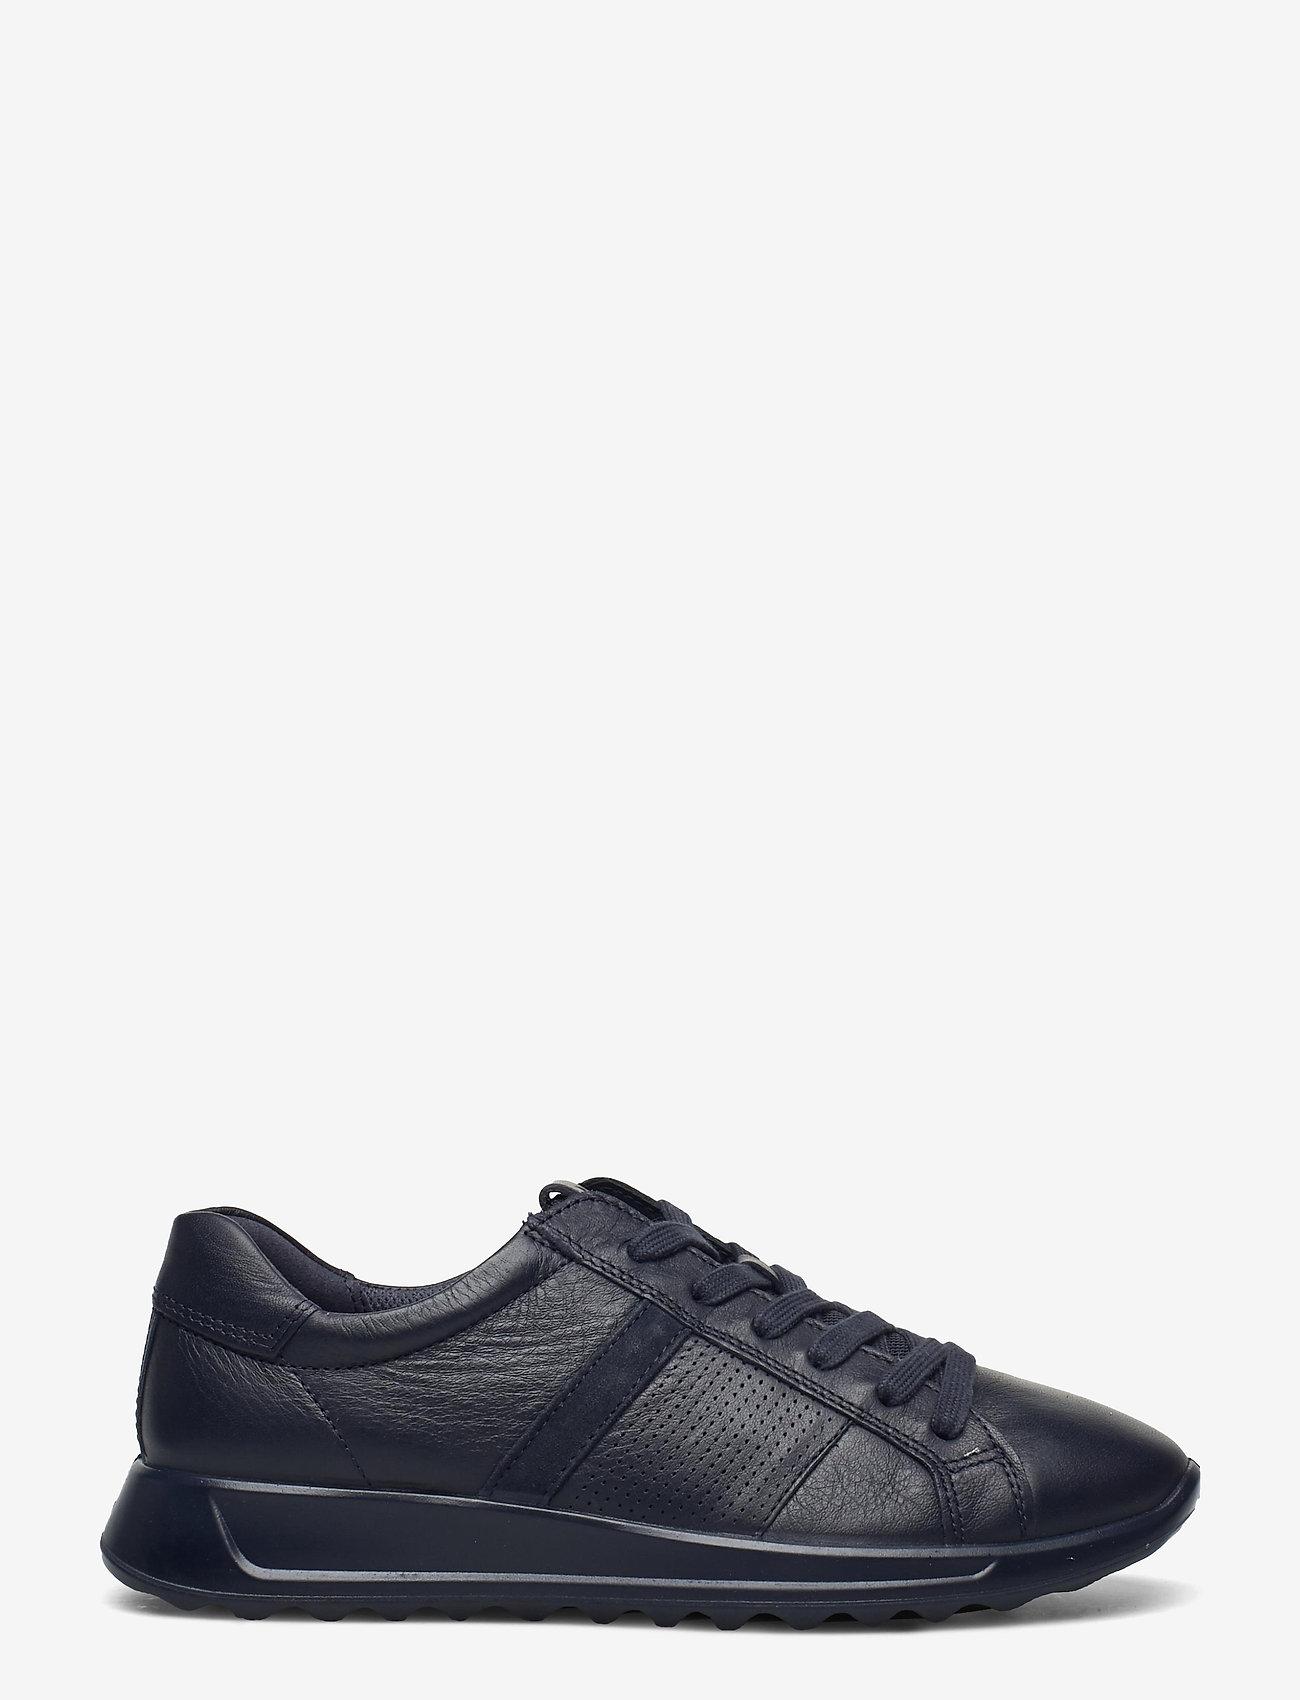 ECCO - FLEXURE RUNNER W - lage sneakers - marine/marine - 1